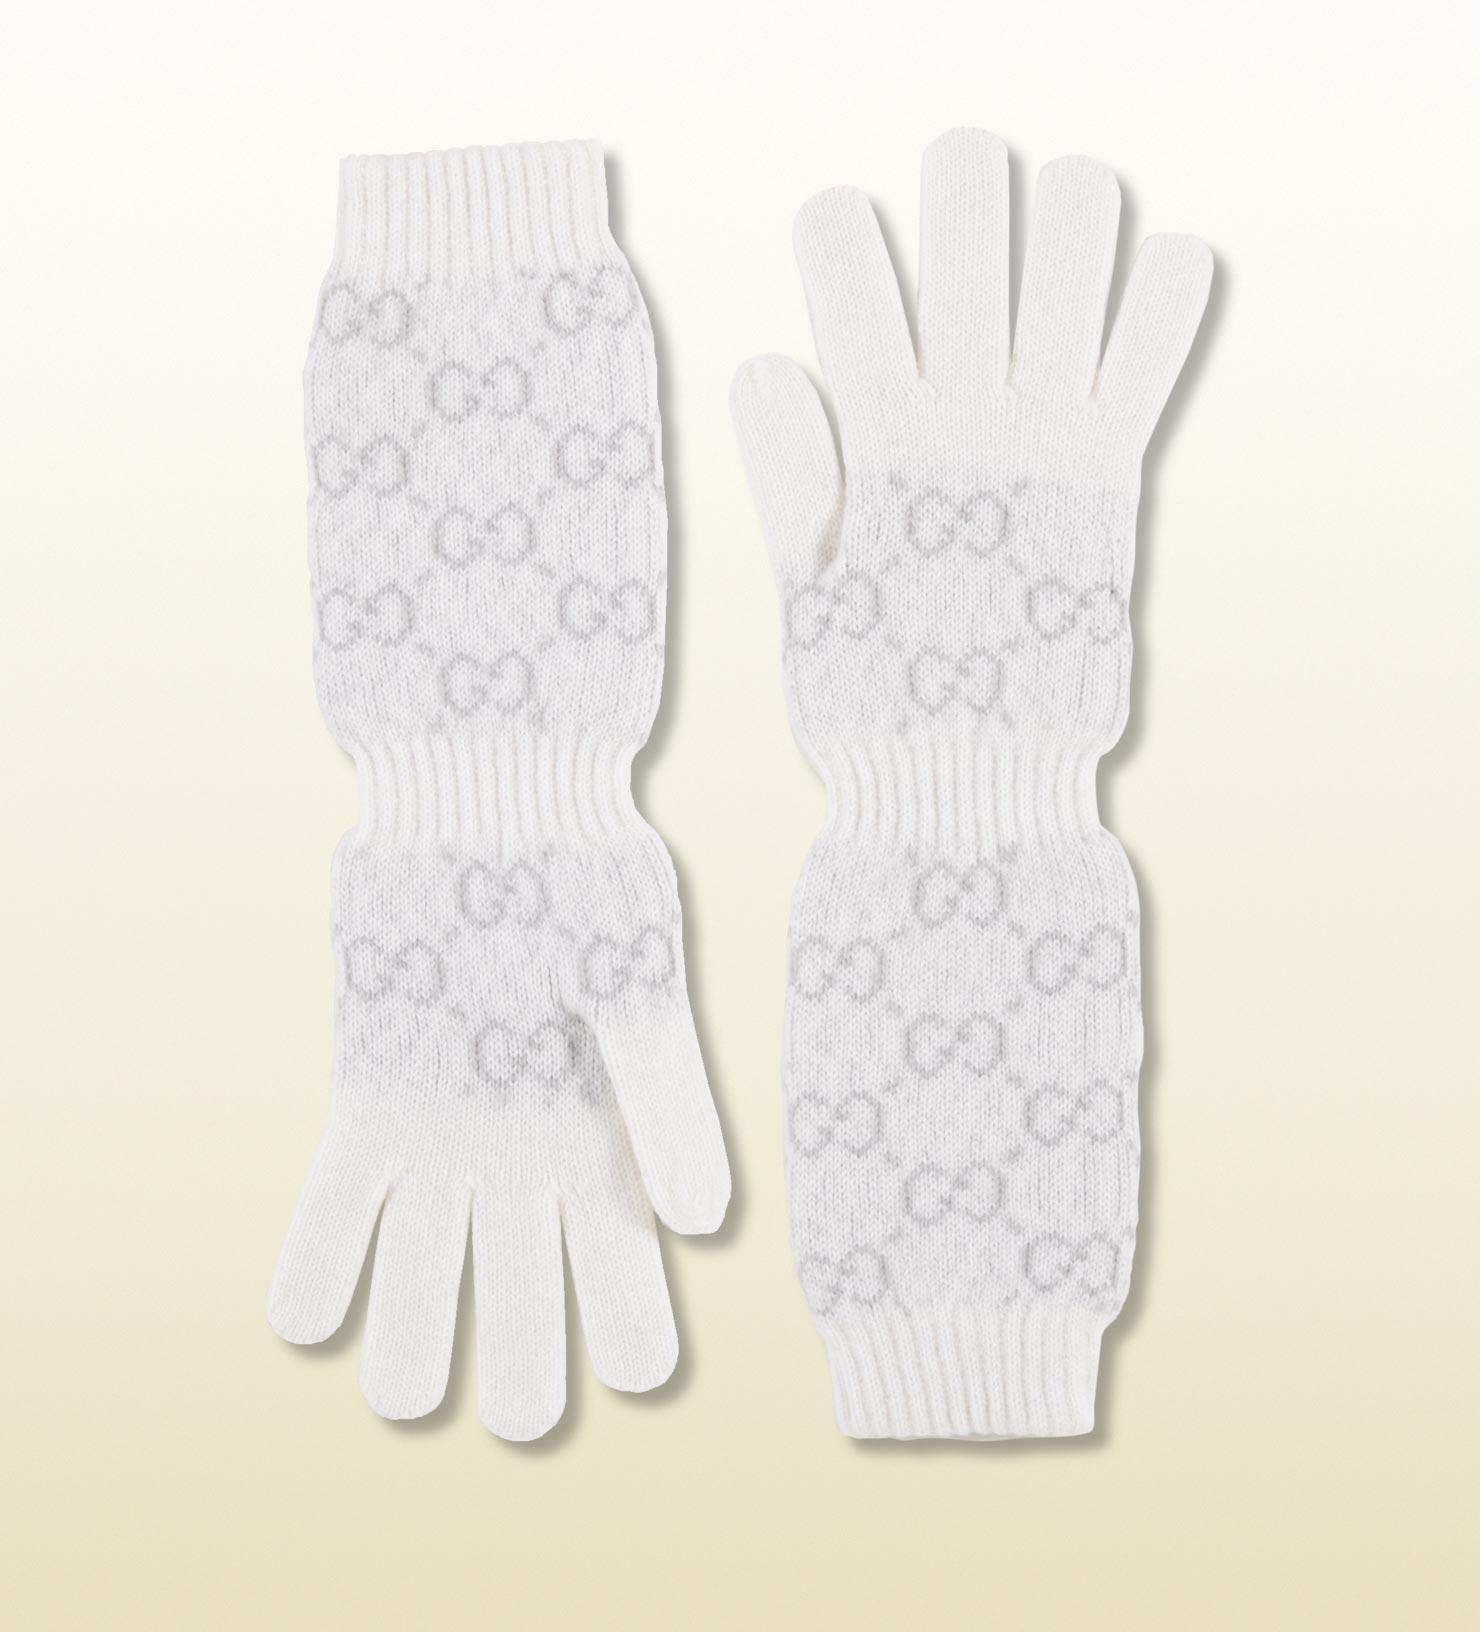 Knitting Pattern Long Gloves : Gucci Womens Knit Gg Pattern Long Gloves in White Lyst